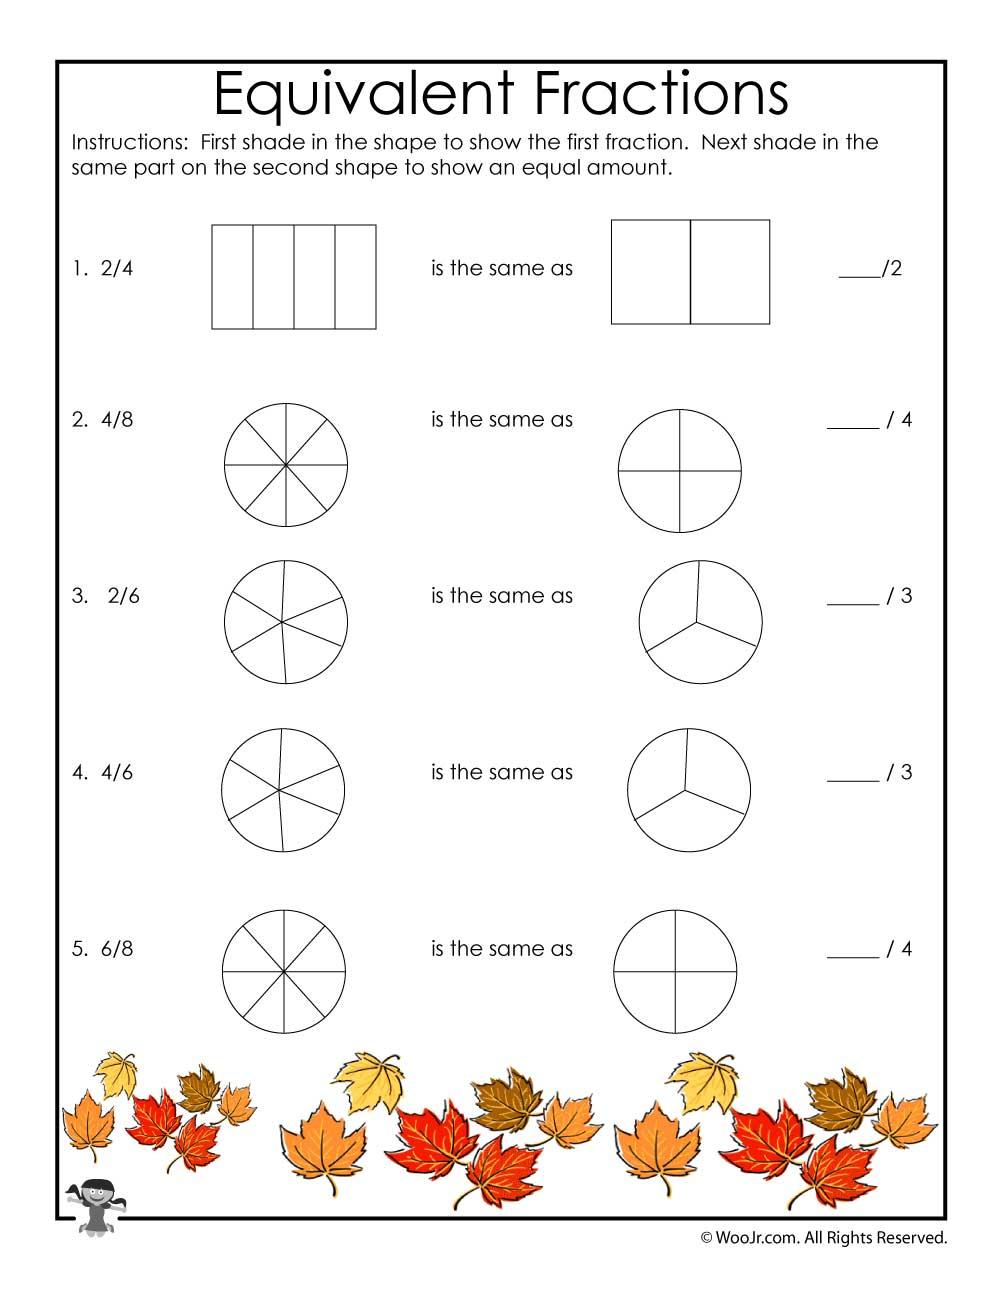 medium resolution of Fall Equivalent Fractions Worksheet   Woo! Jr. Kids Activities